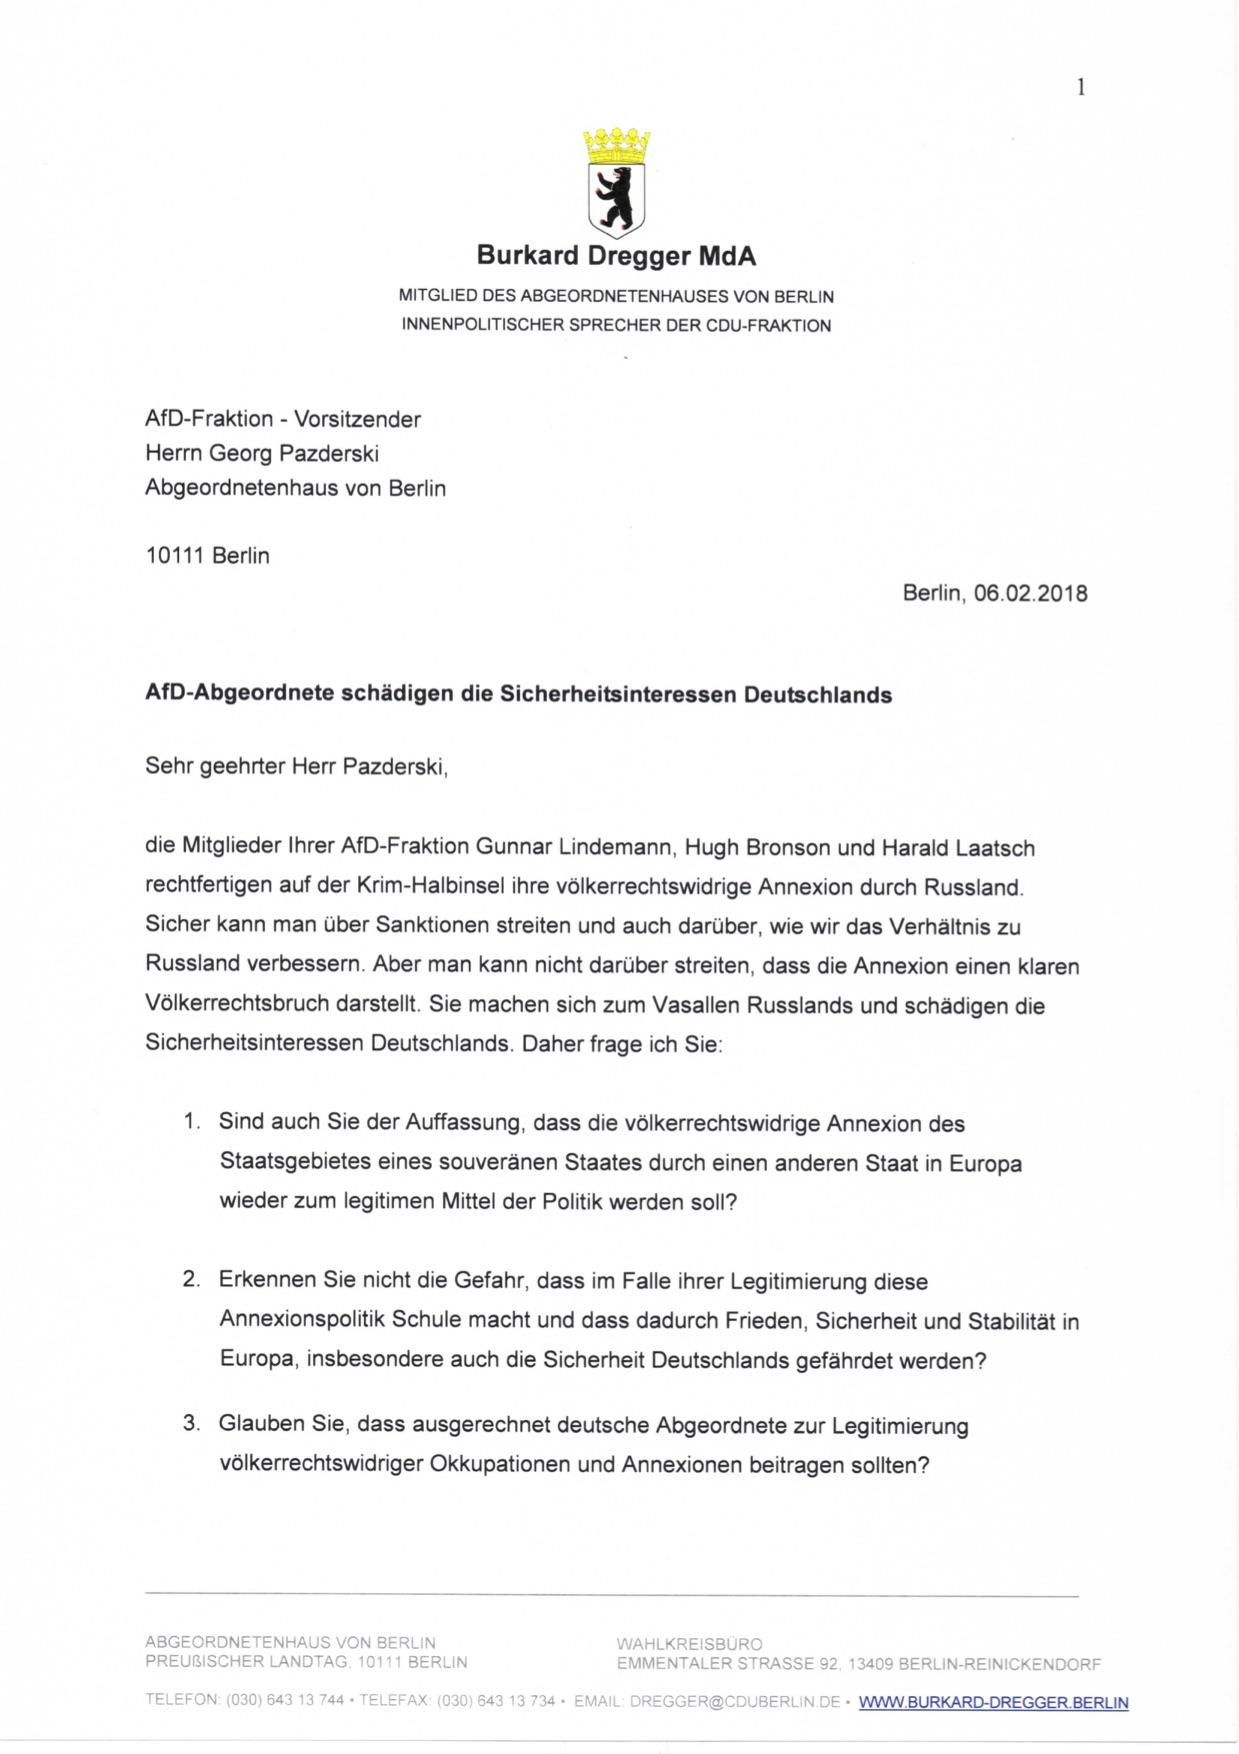 Burkard Dregger Mda Offener Brief An Herrn Pazderski